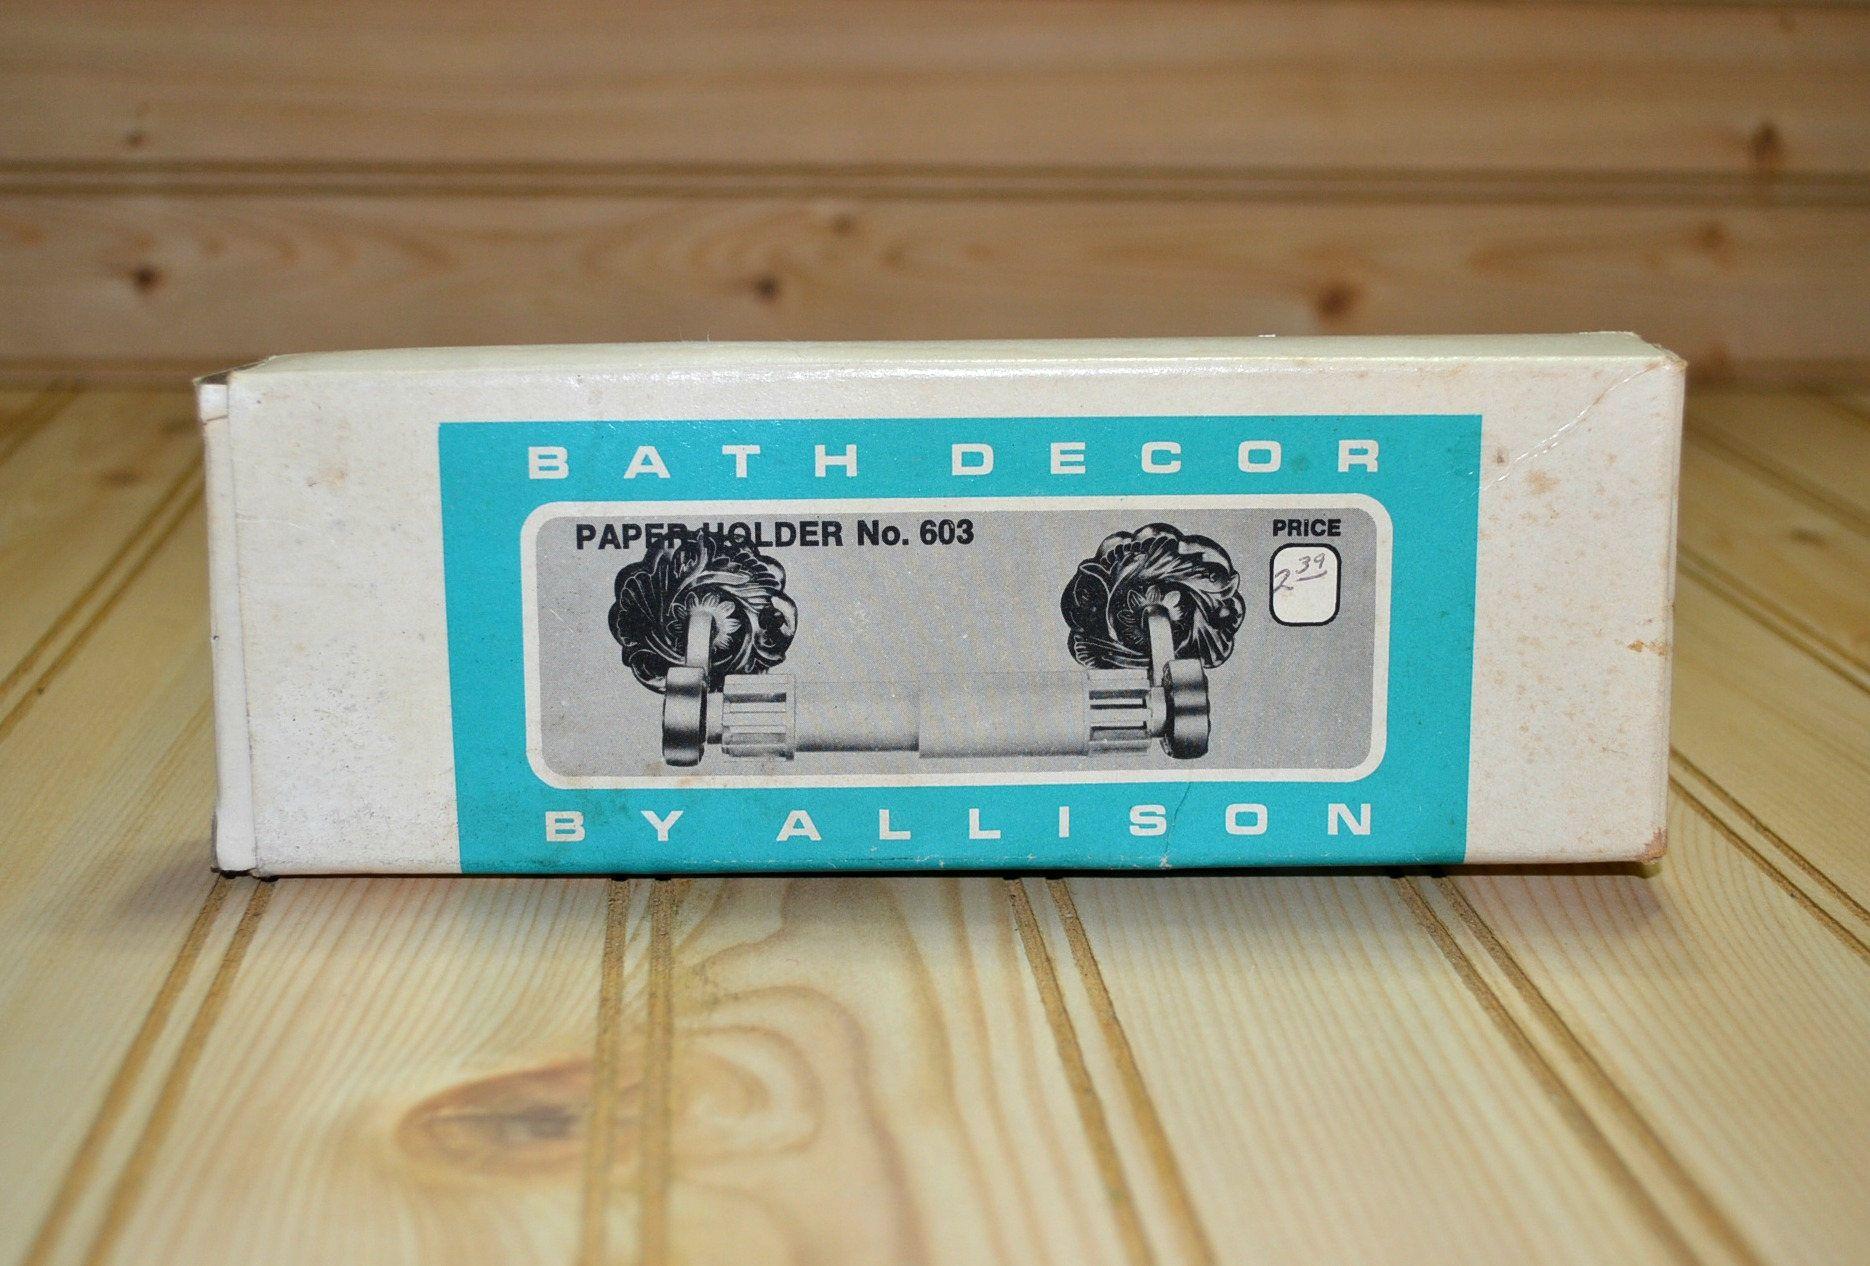 japanese toilet paper holder. Vintage Allison Japan Toilet Paper Holder No  603 Bath Decor Hardware Chrome Finish Never Used